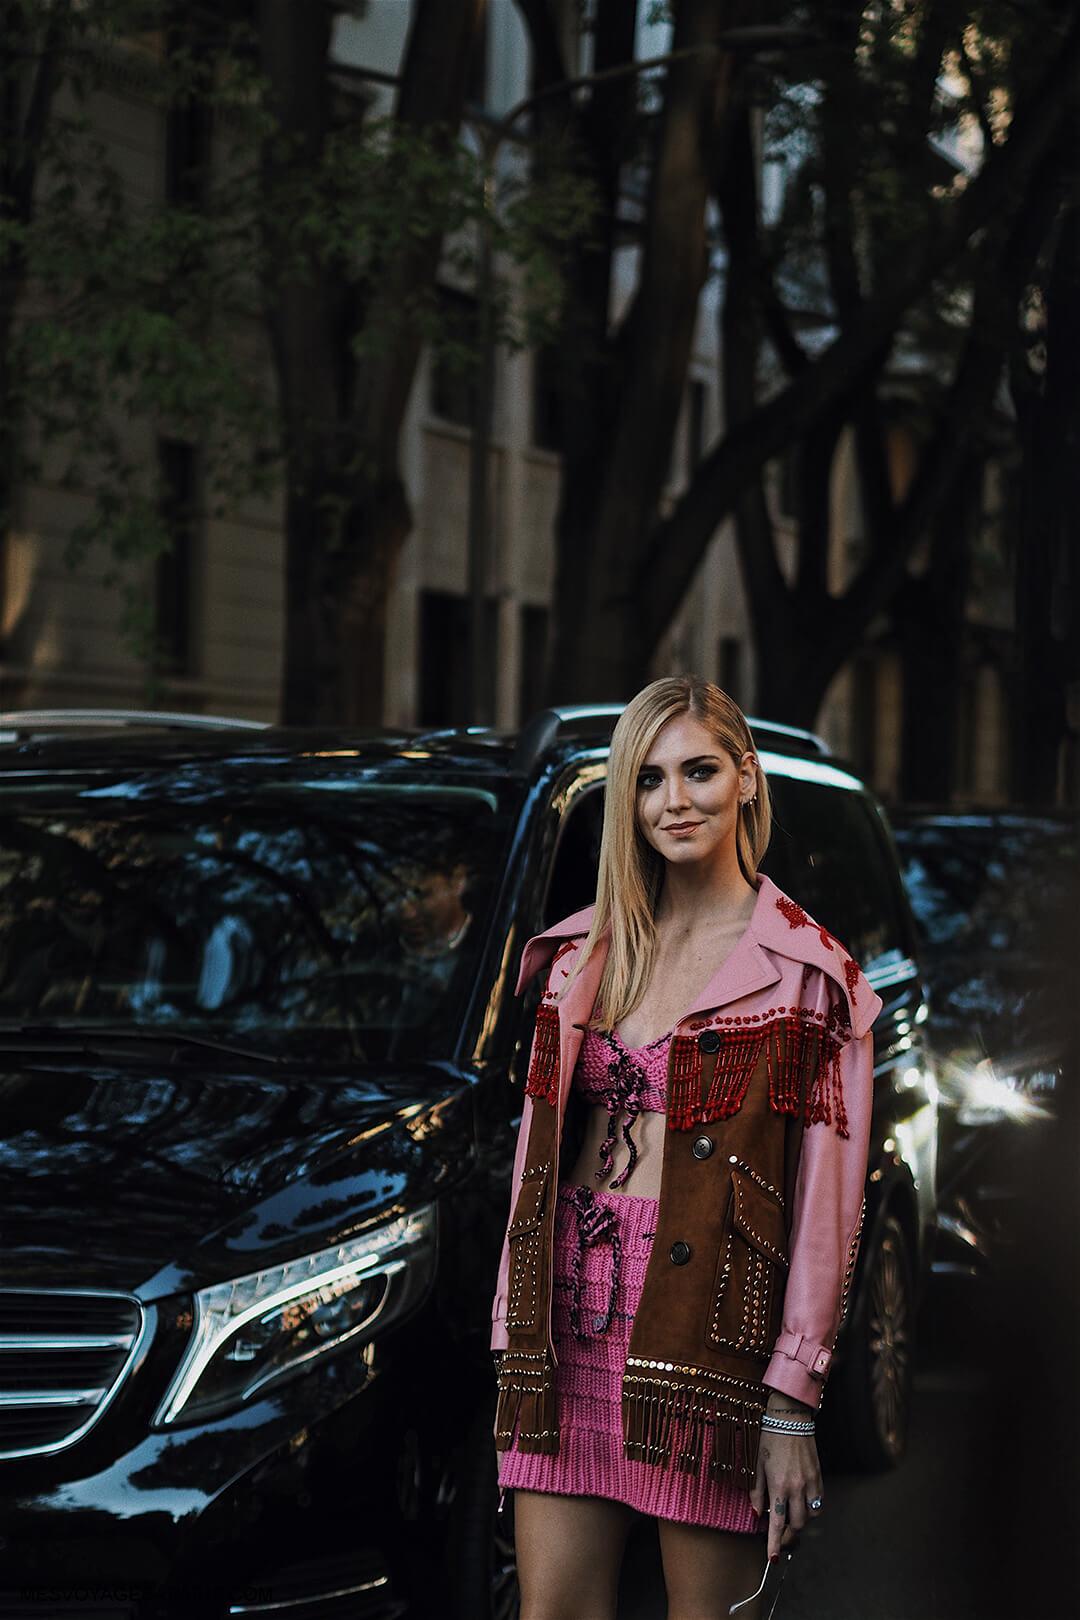 chiara-ferragni-pink-look-milan-fashion-week-street-style